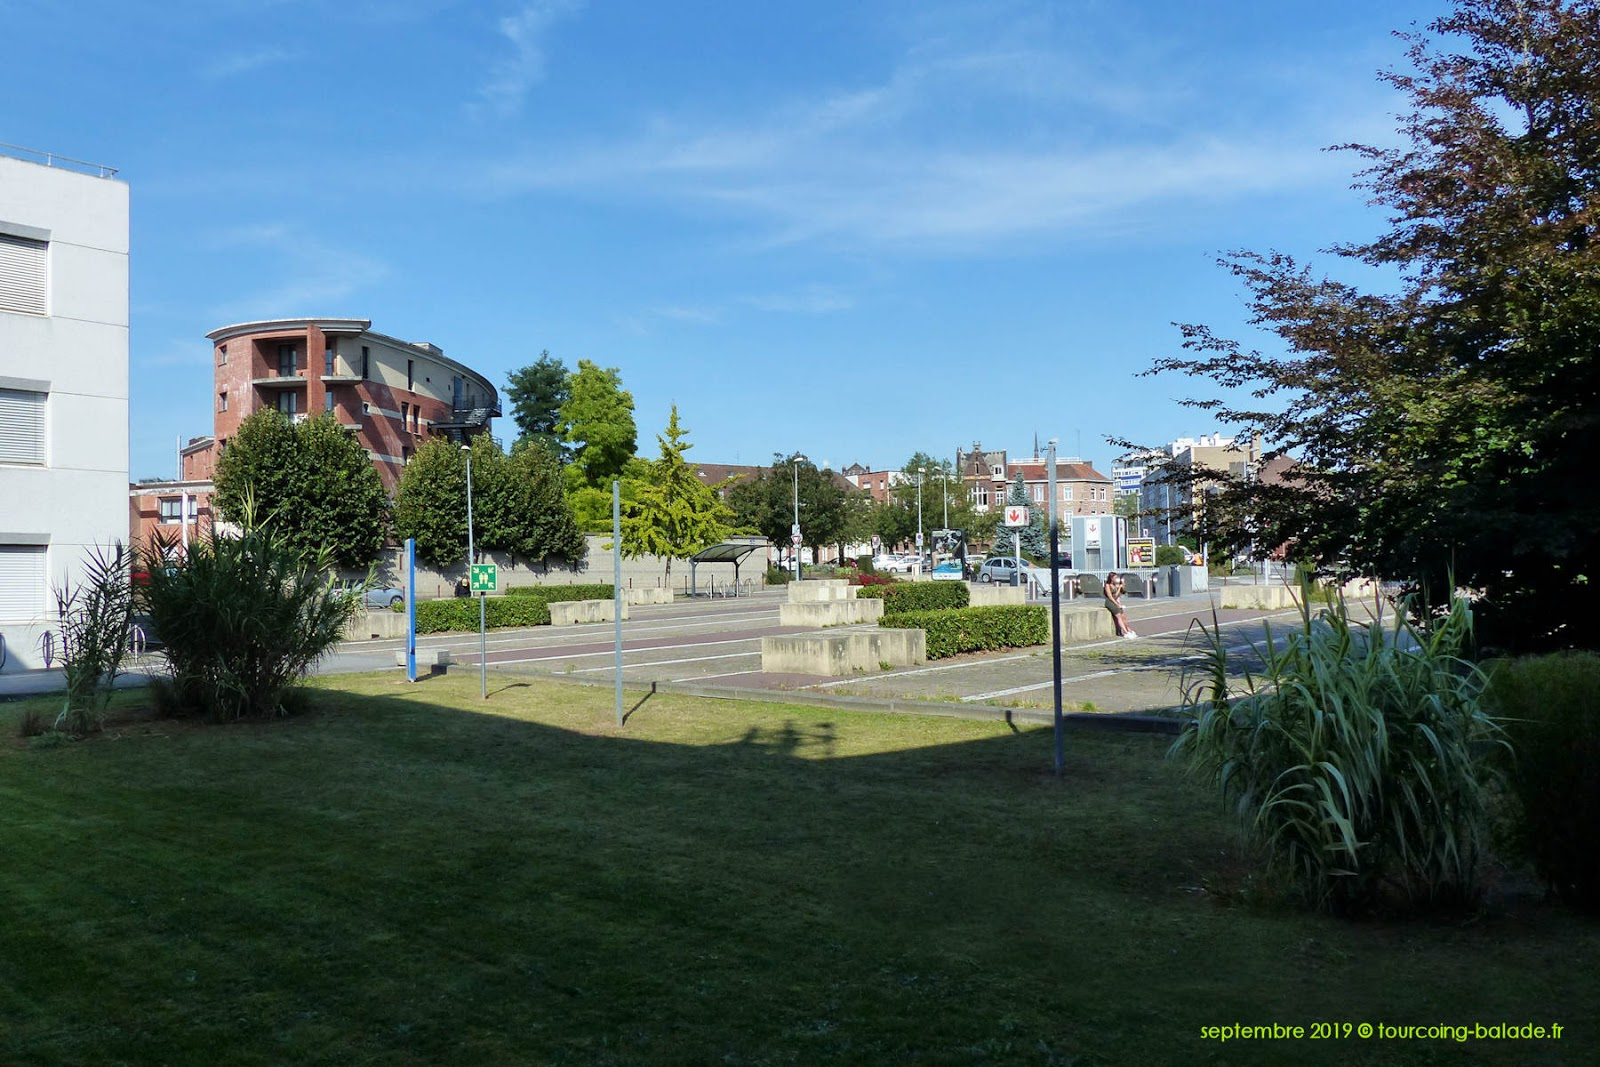 Place Sébastopol, EHPAD Acacias, Tourcoing 2019